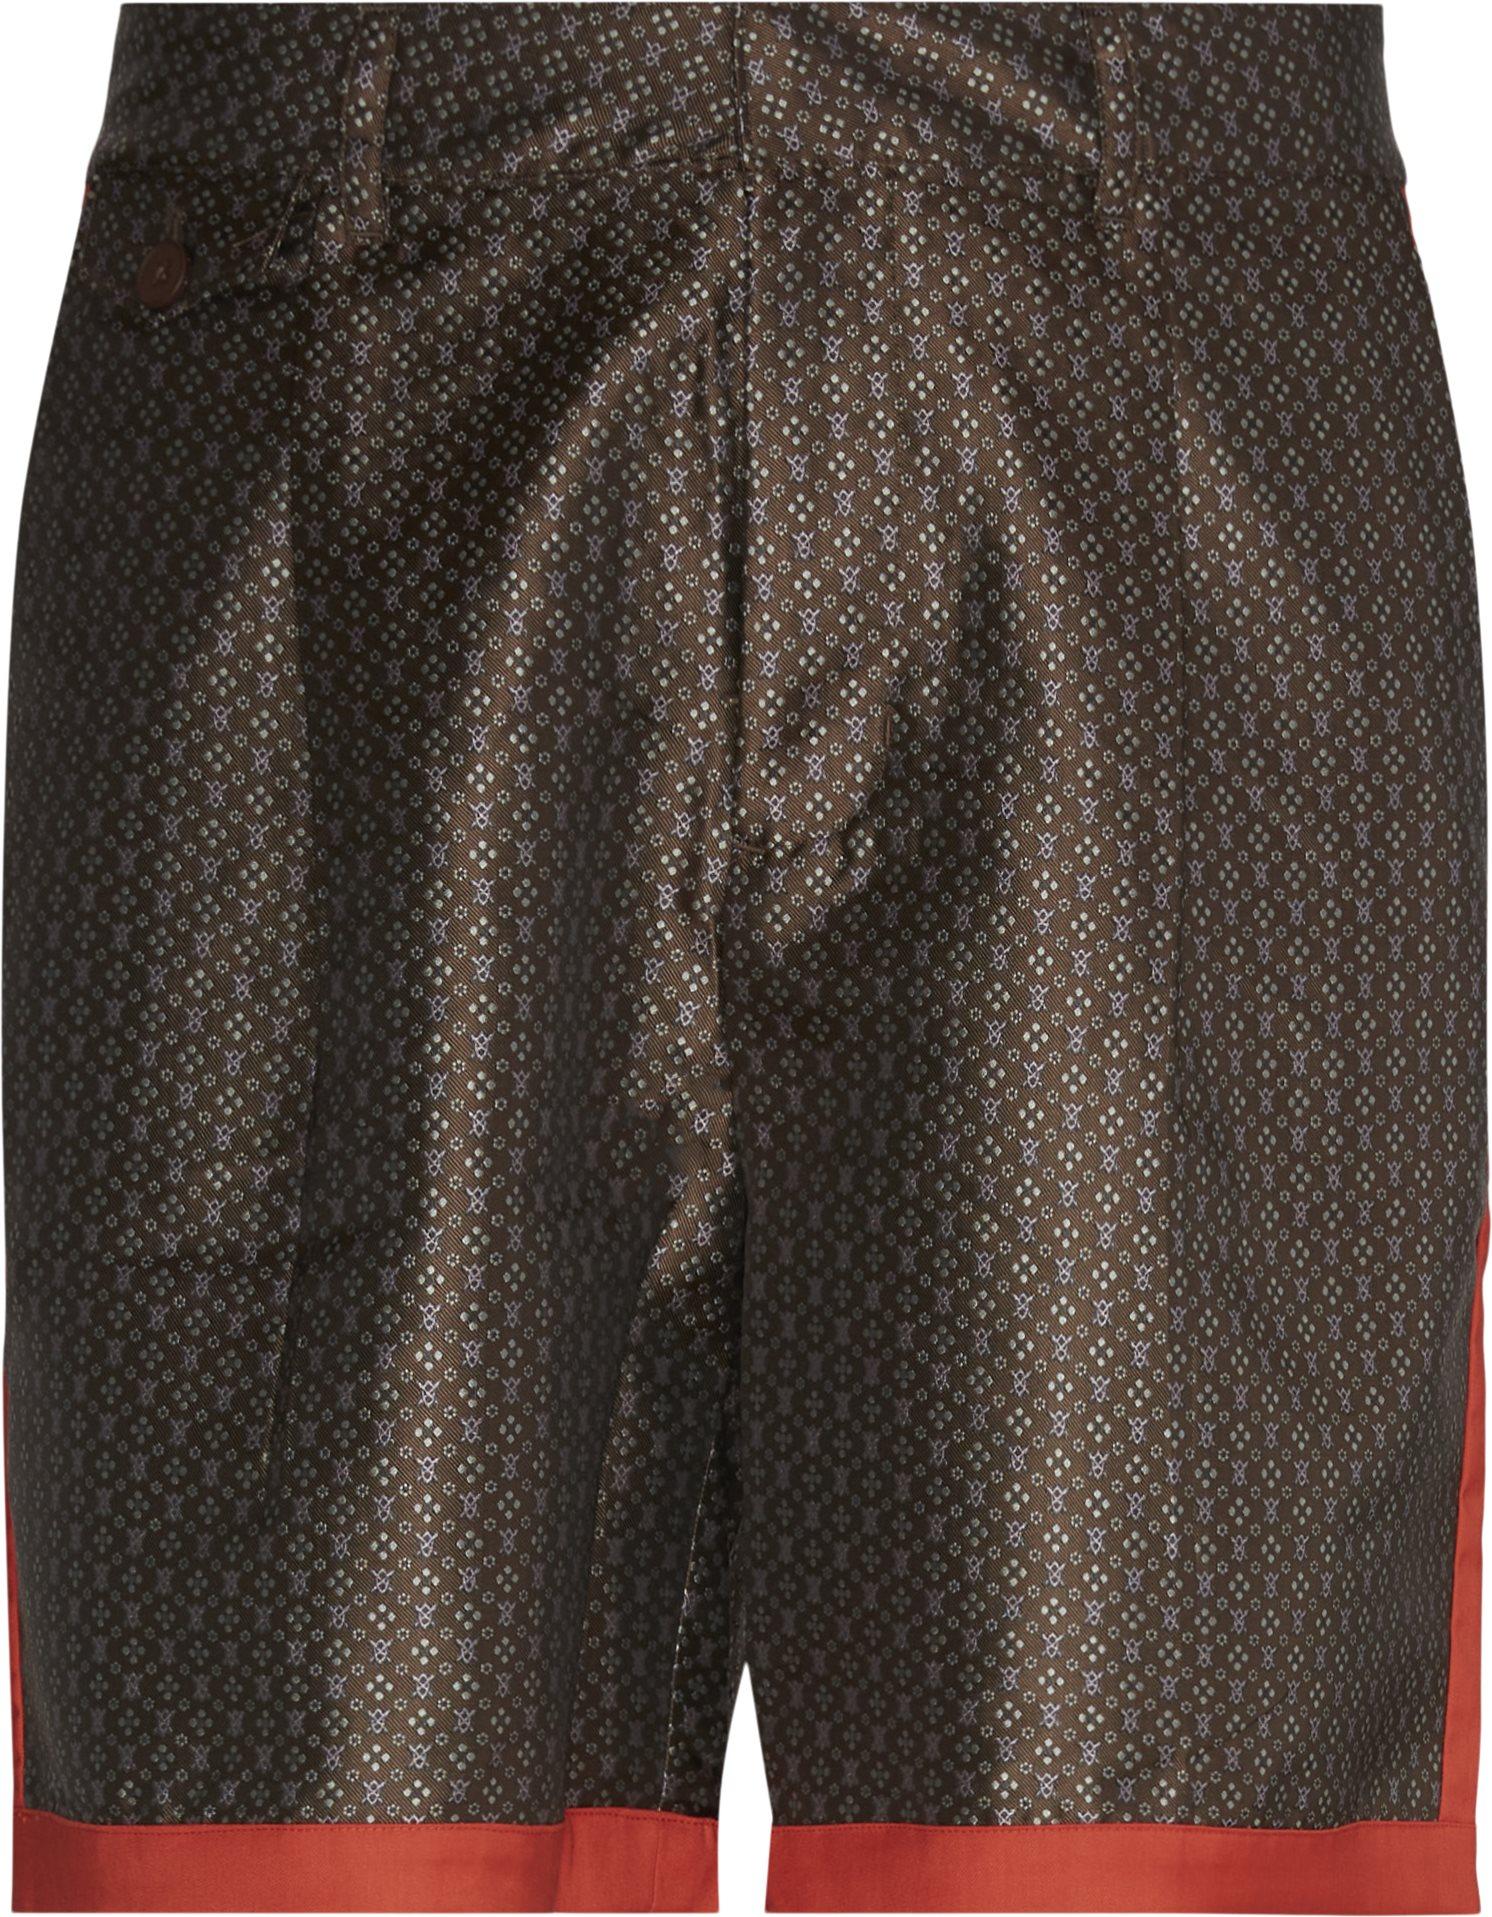 Kenton Shorts - Shorts - Regular fit - Brun